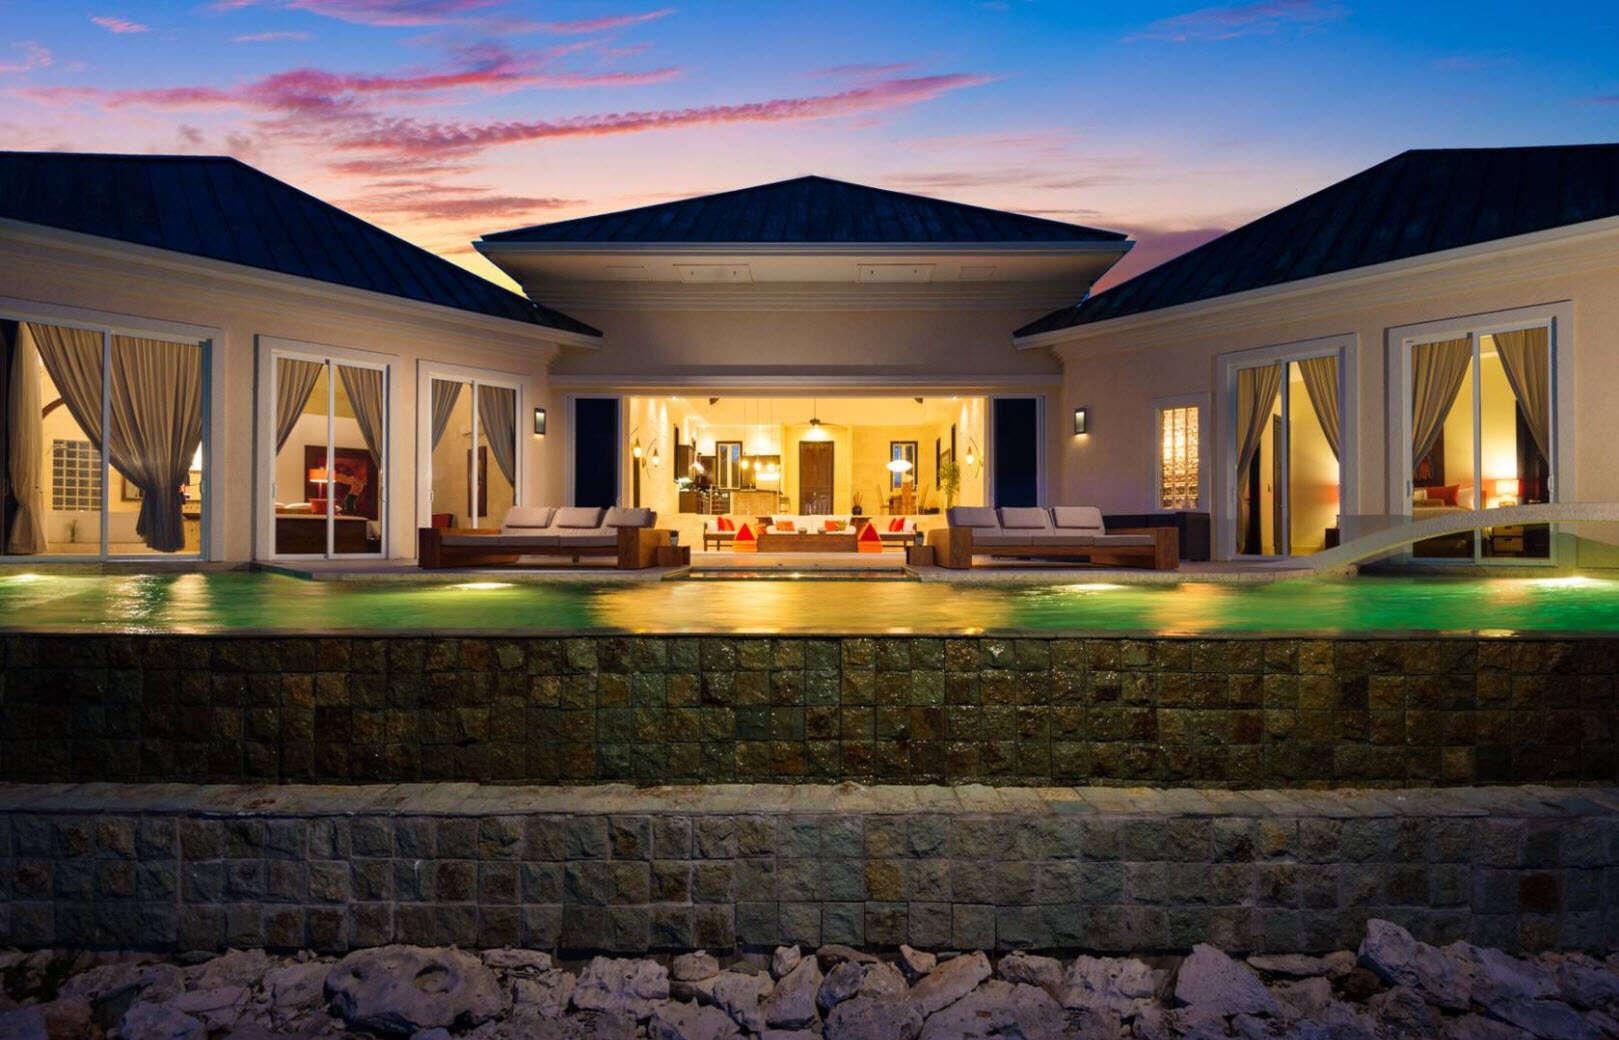 Luxury villa rentals caribbean - Turks and caicos - Providenciales - Turtle tail - Balinese Villa - Image 1/12